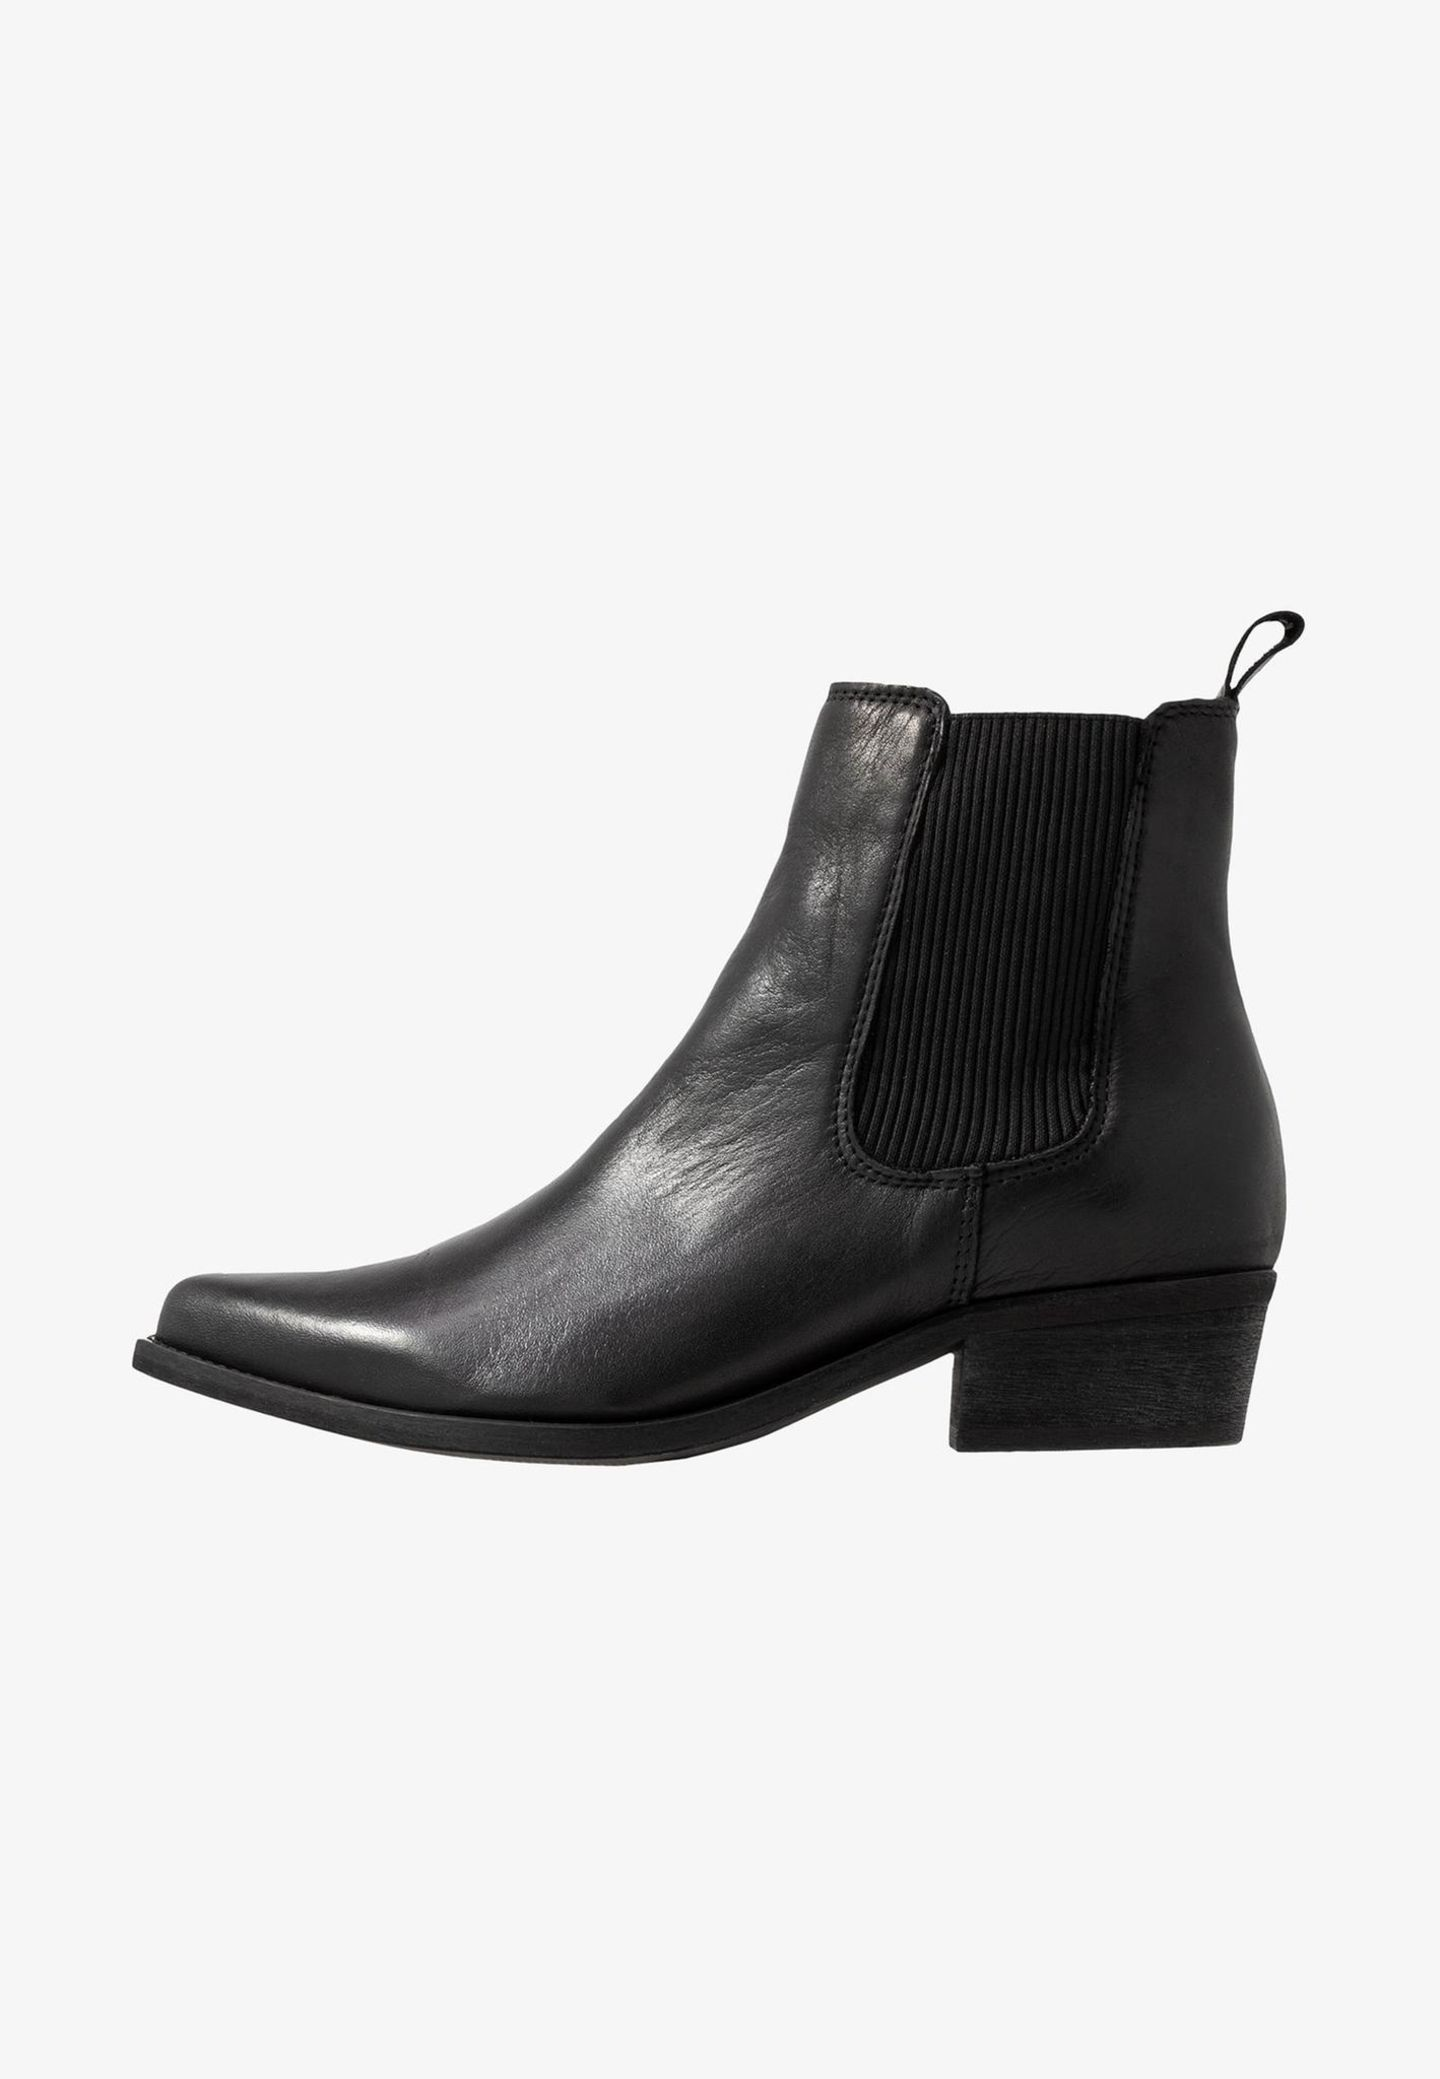 Mode-Klassiker: Bianco Chelsea Boots